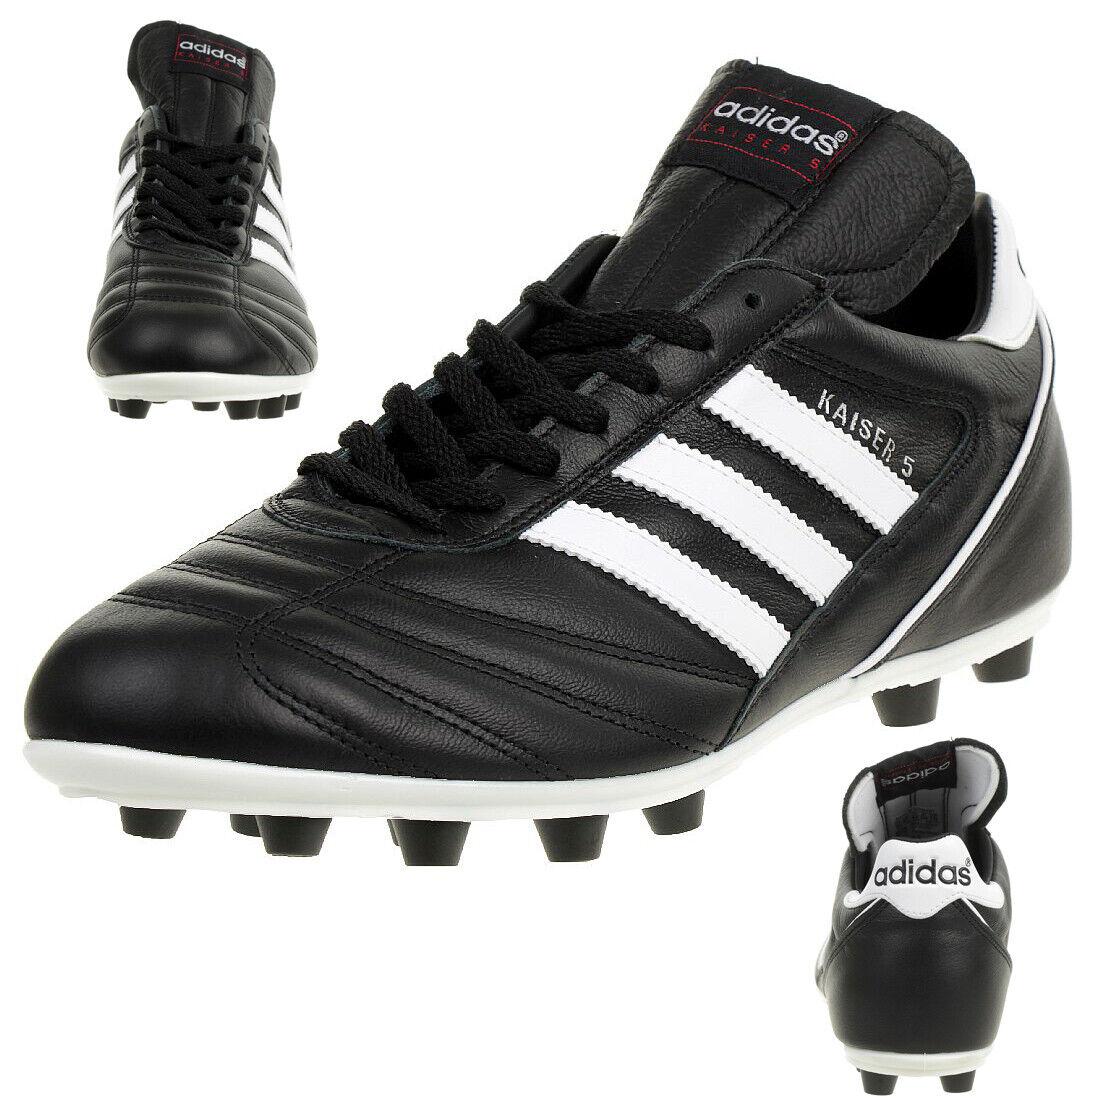 Dettagli su Scarpe da calcio uomo Adidas Kaiser 5 Liga 033201 nero bianco